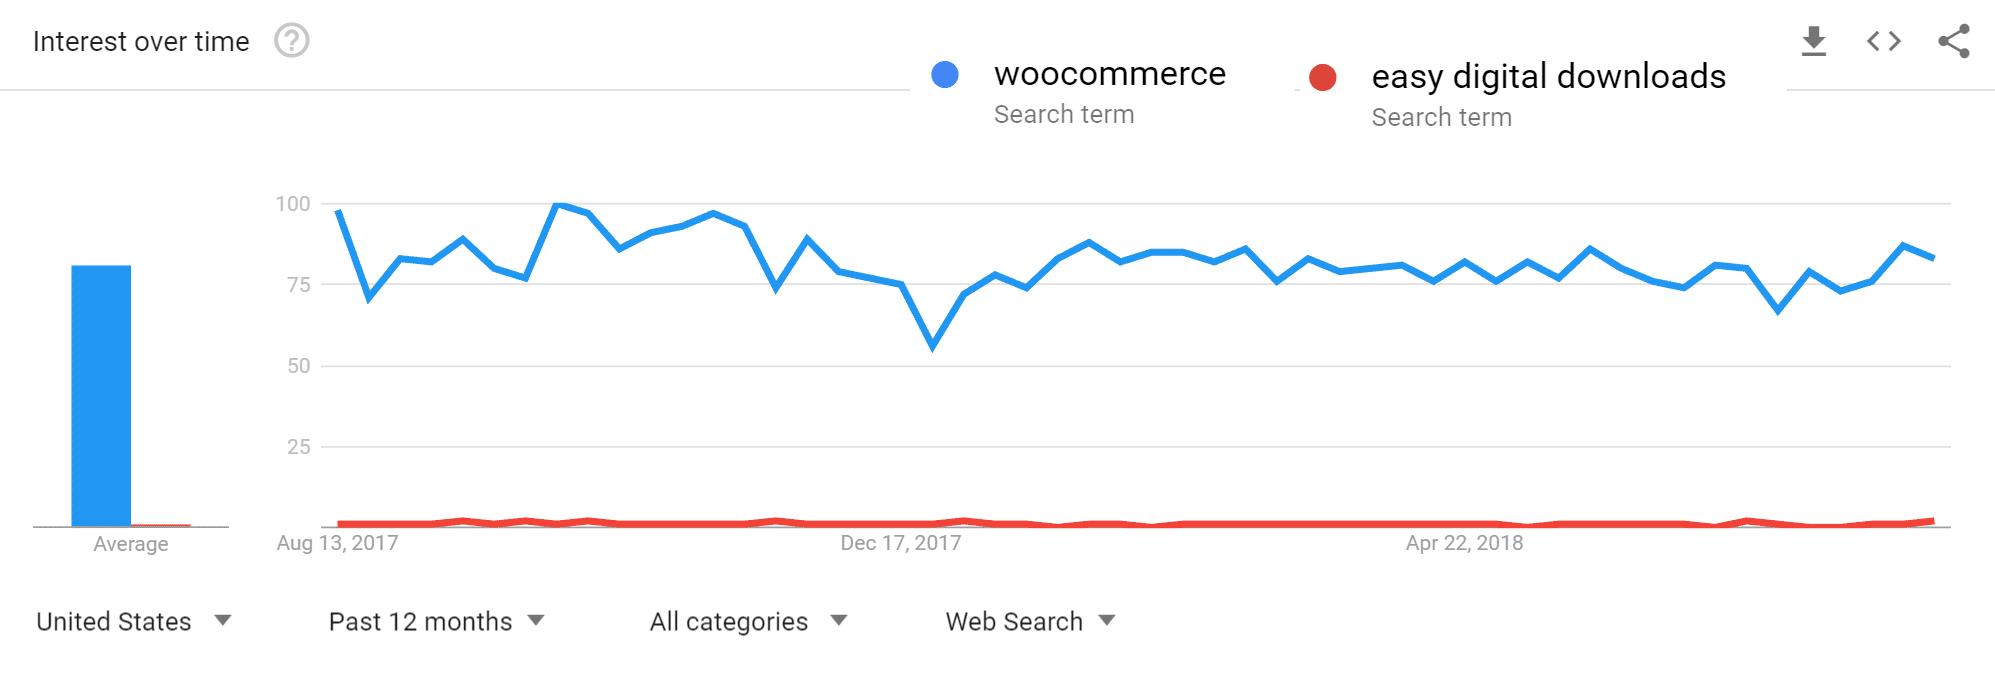 Google Trends - WooCommerce vs Easy Digital Downloads